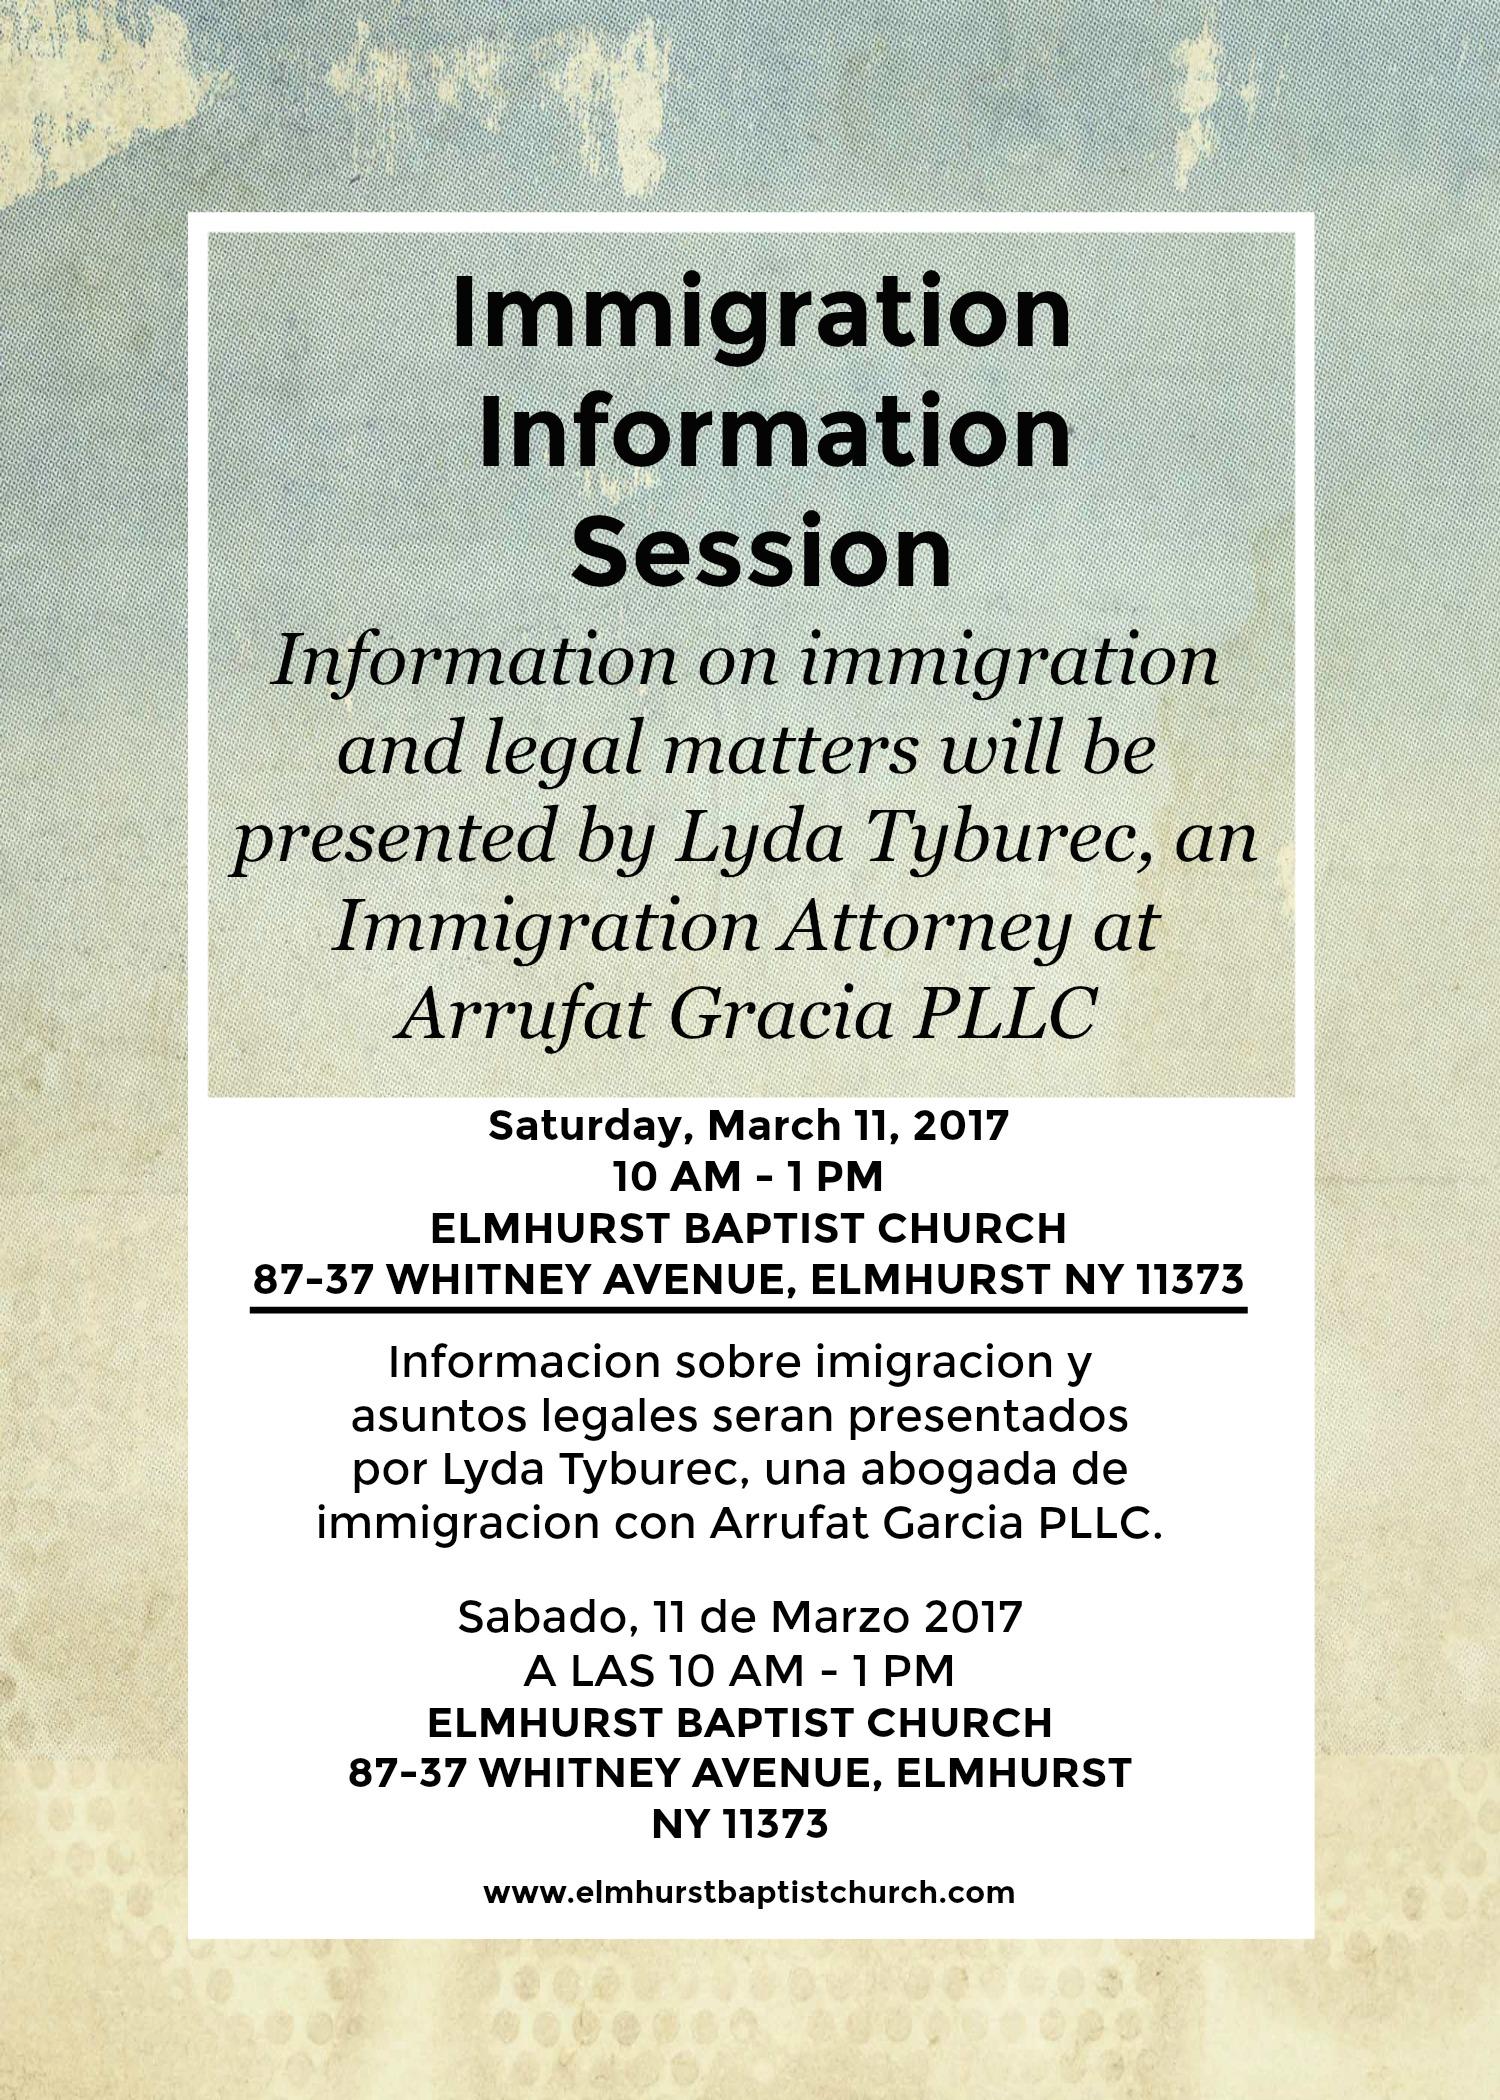 We encourage everyone to come!